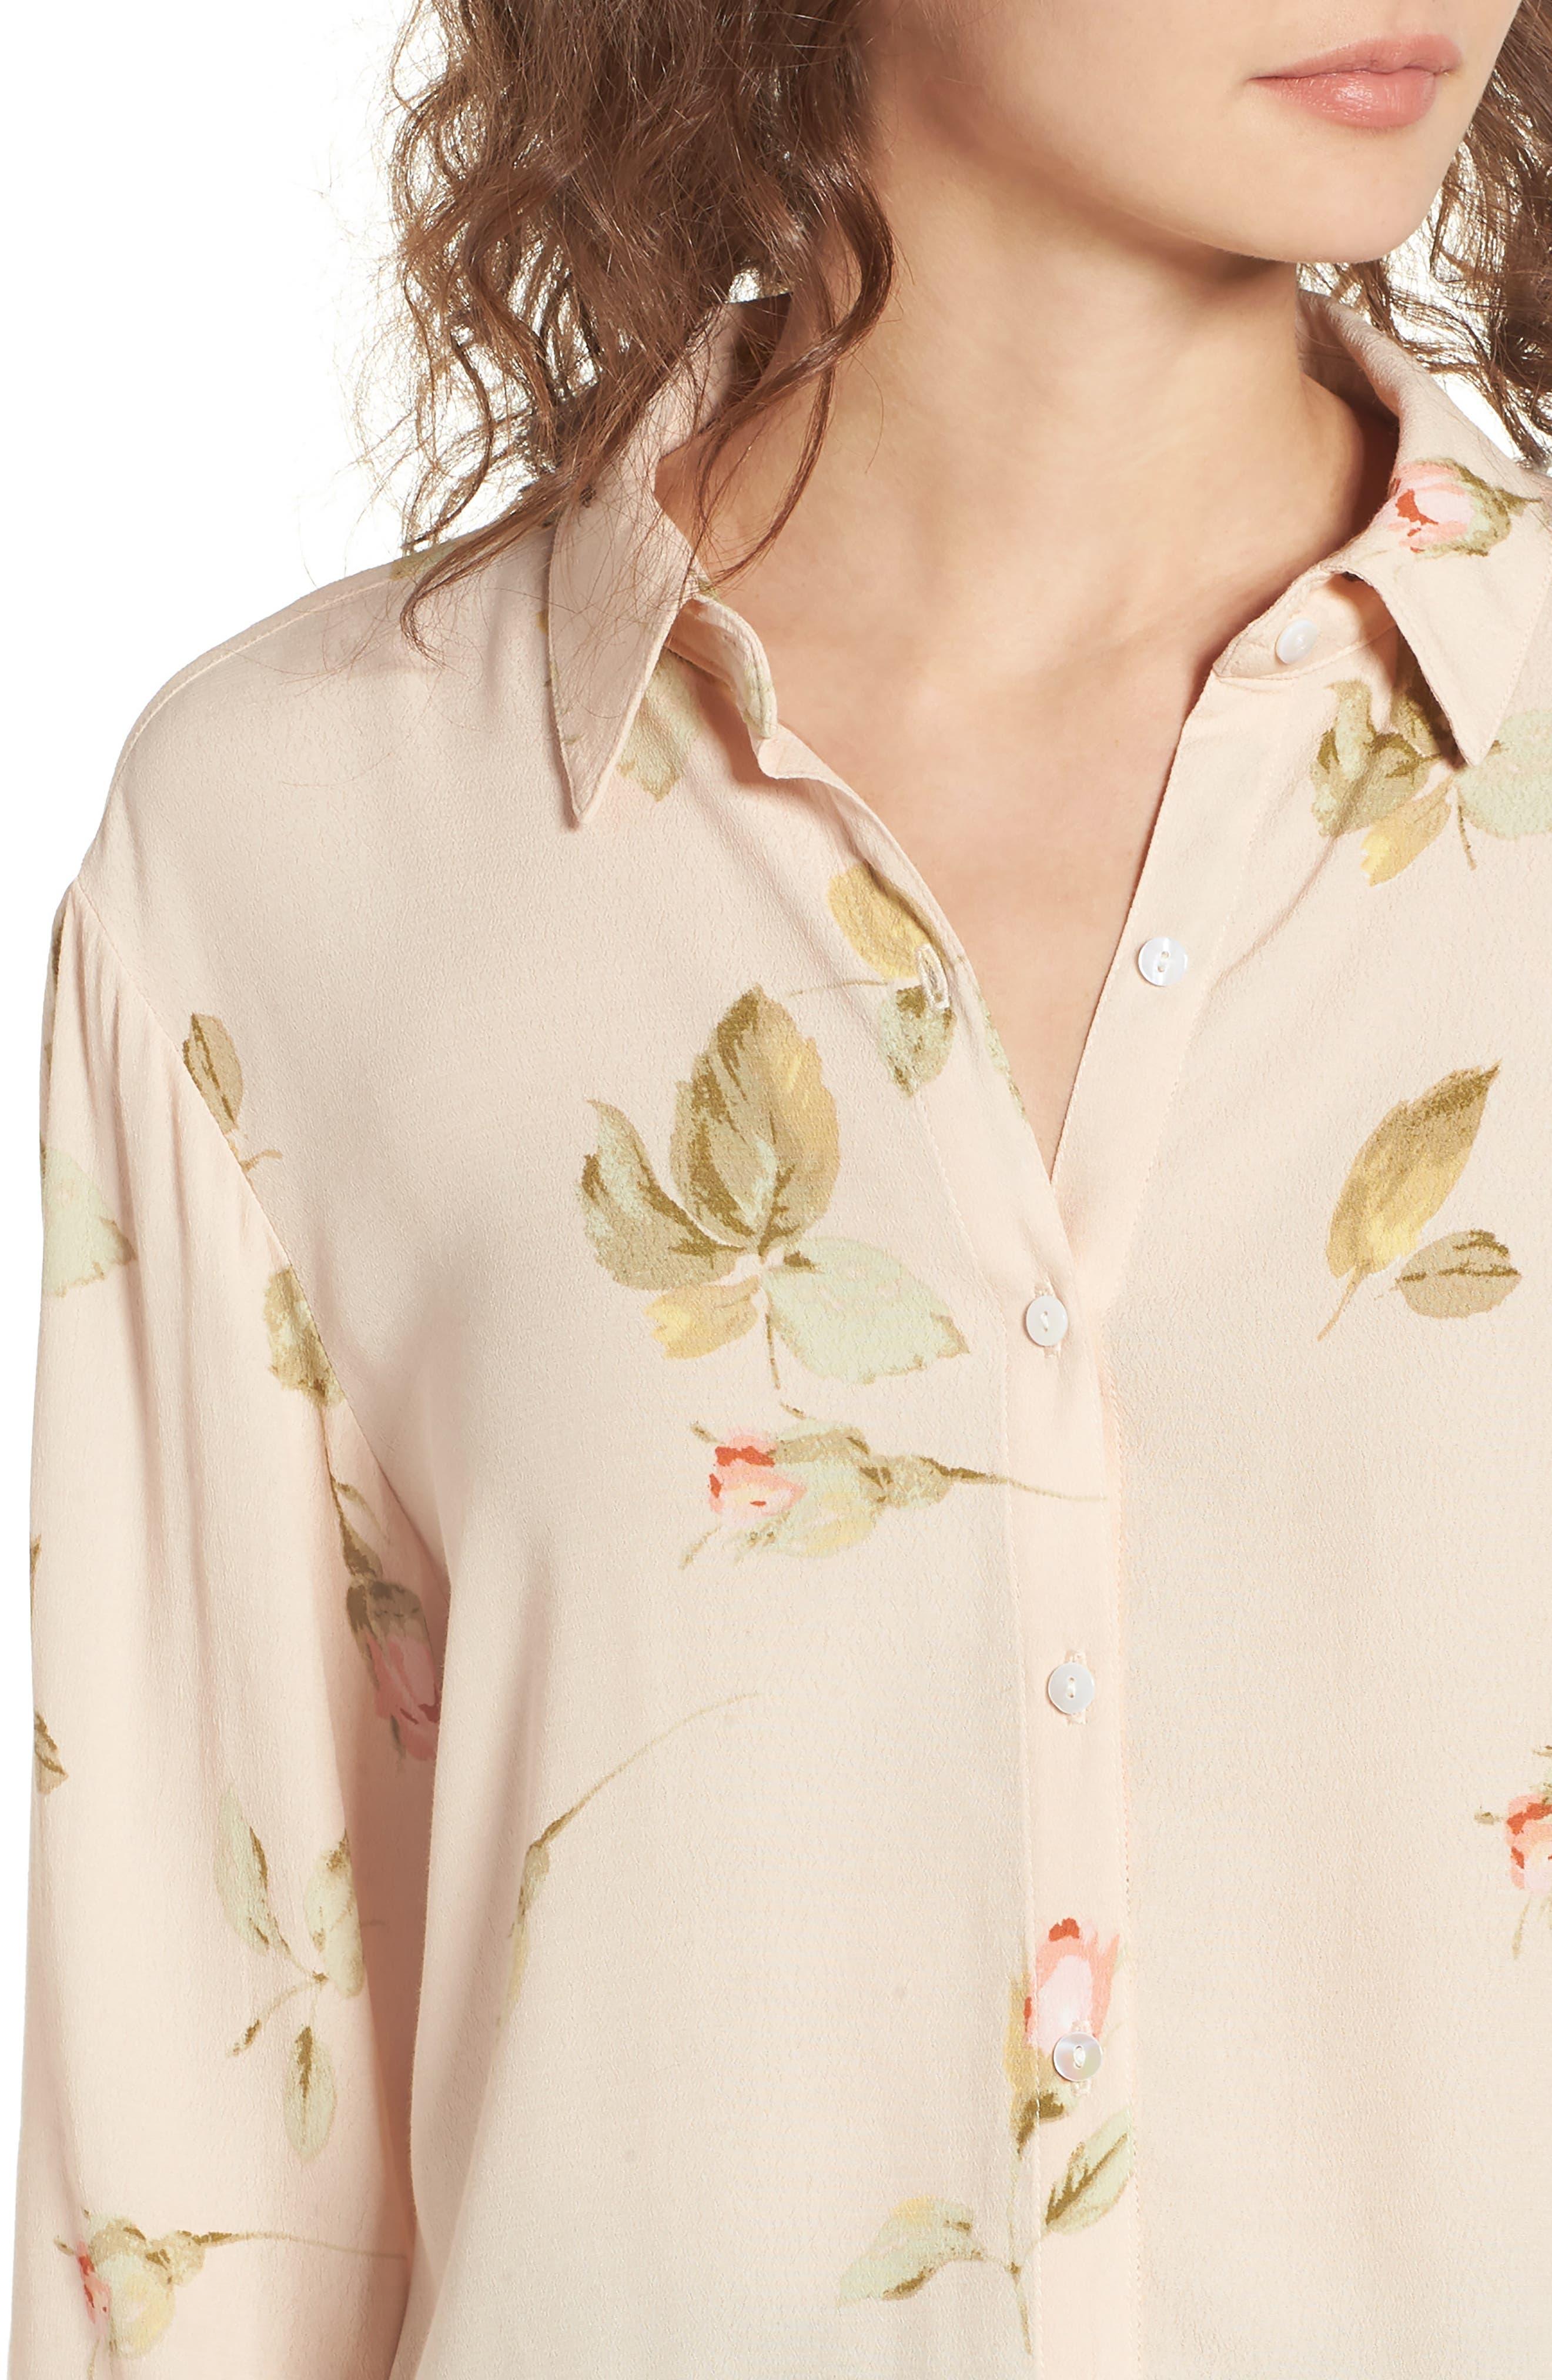 Sinclair Floral Print Shirt,                             Alternate thumbnail 4, color,                             Taupe Multi